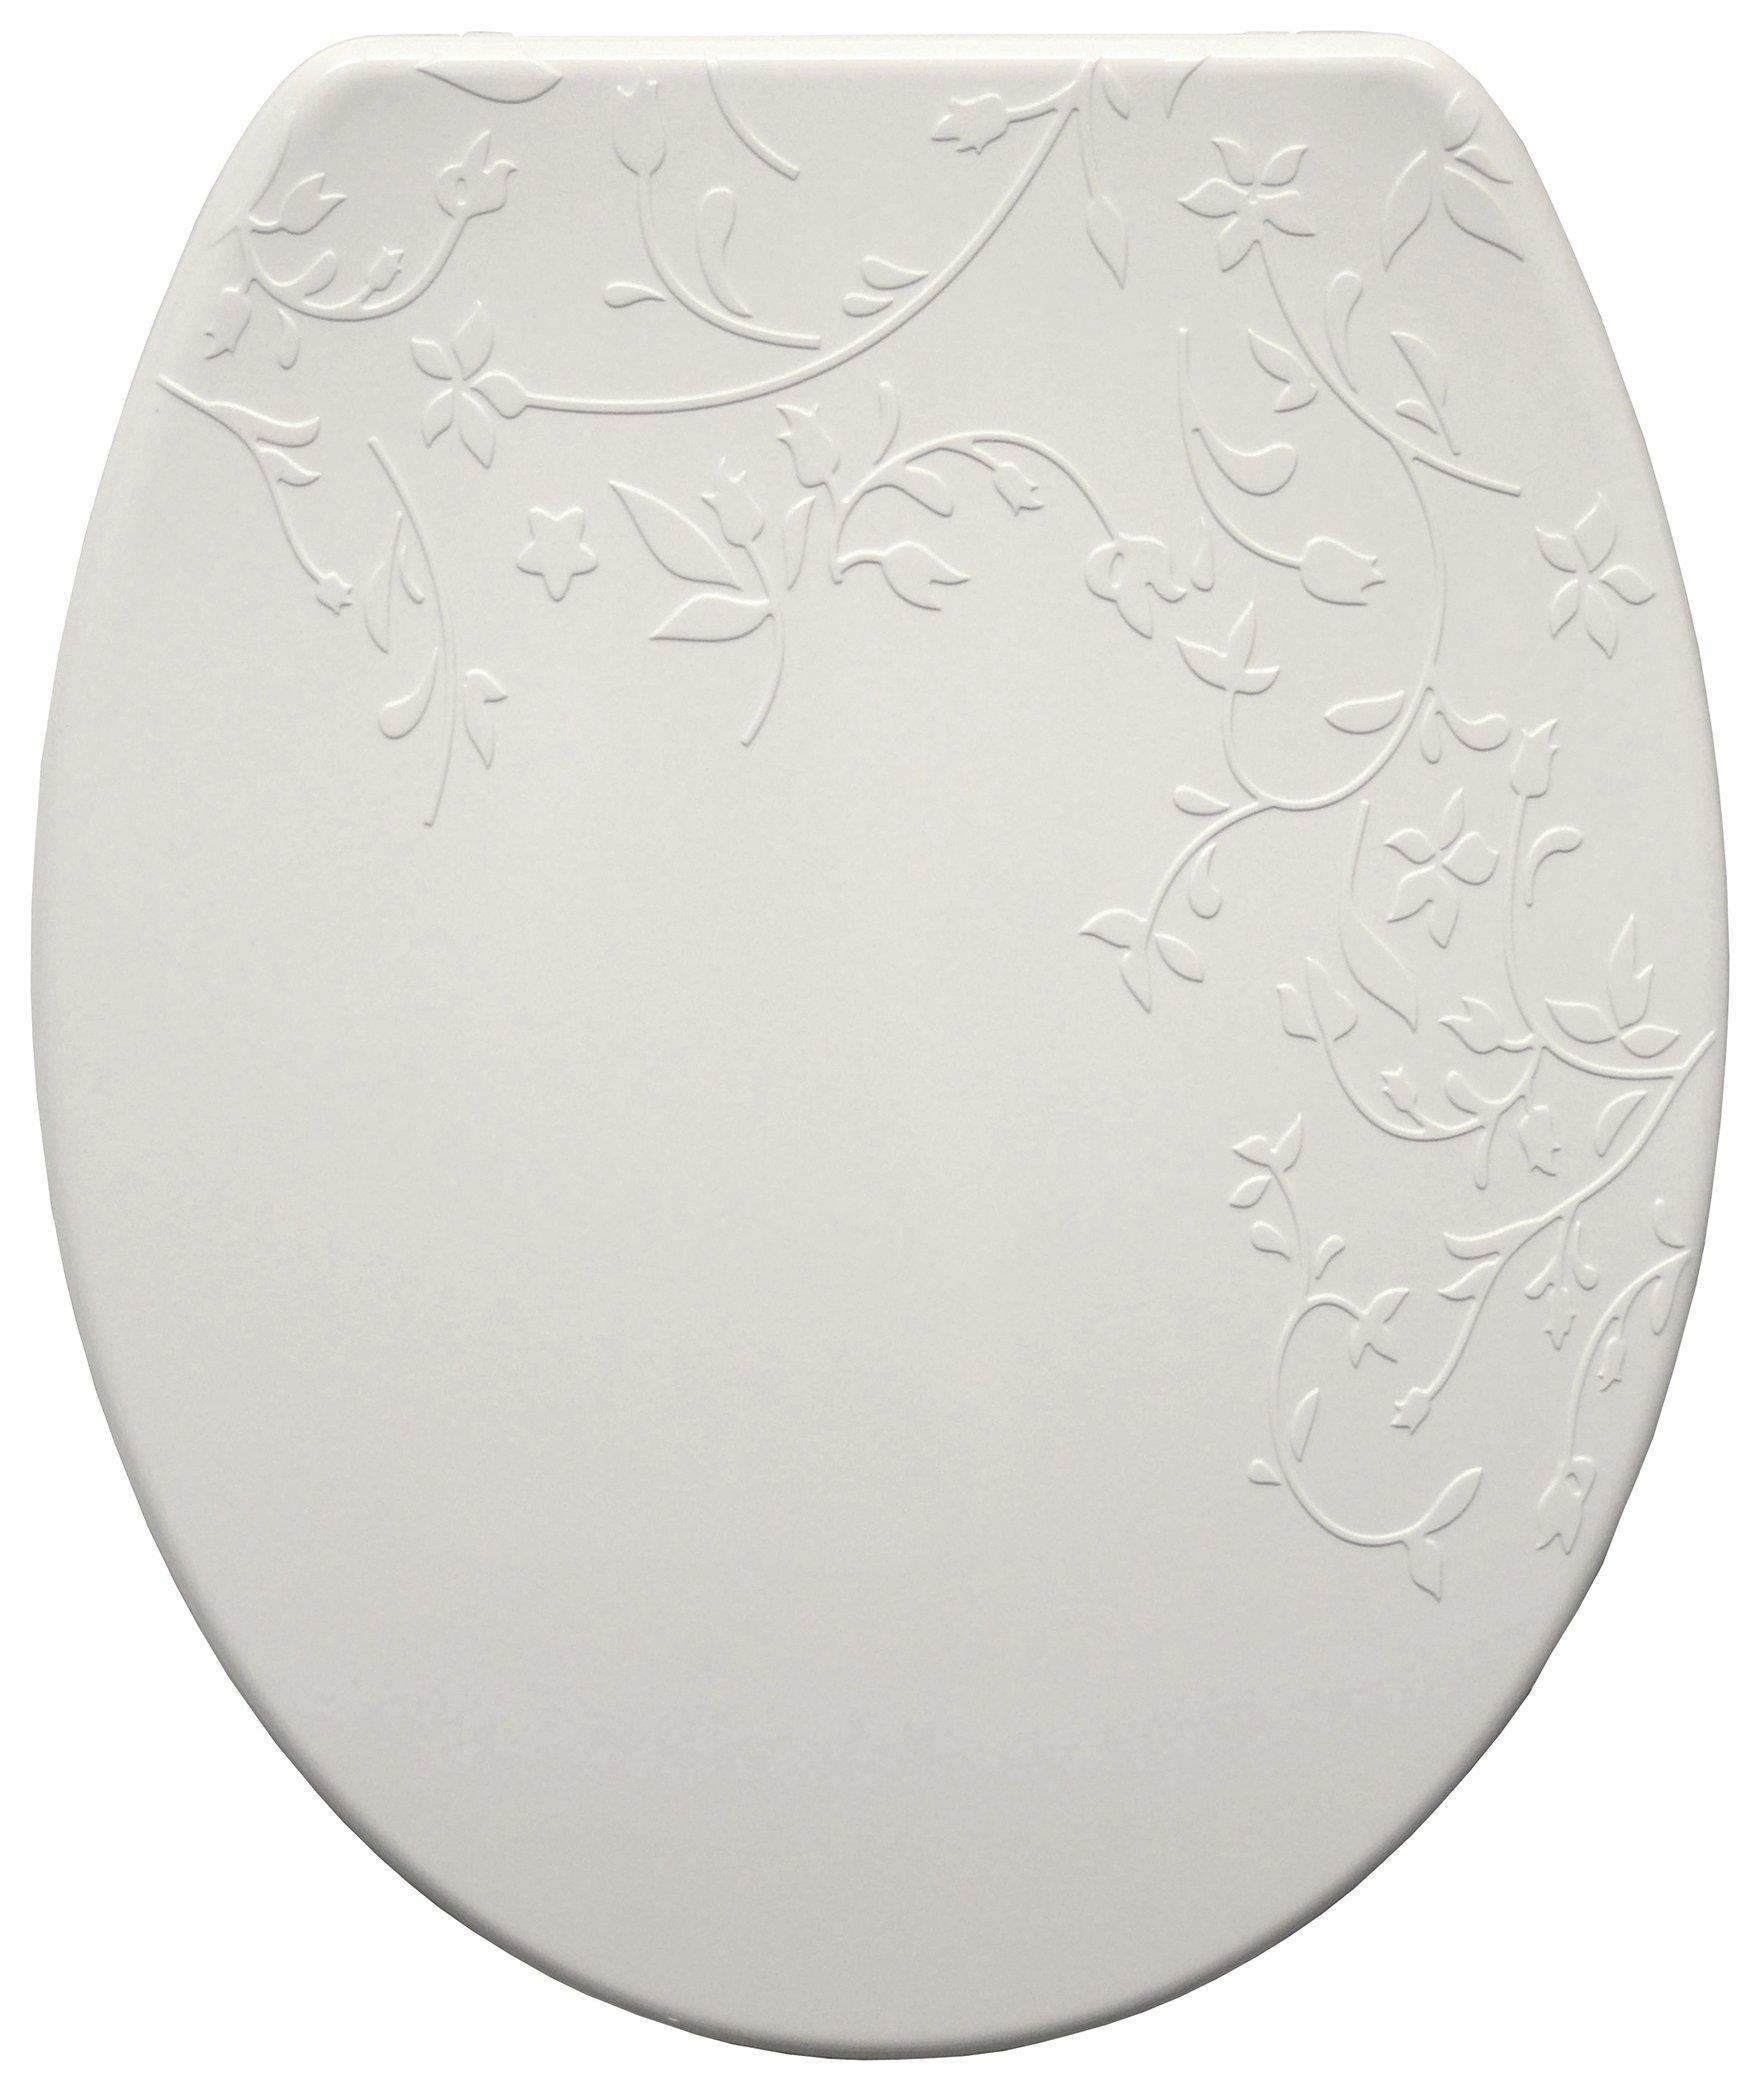 chic bemis new york toilet seat white